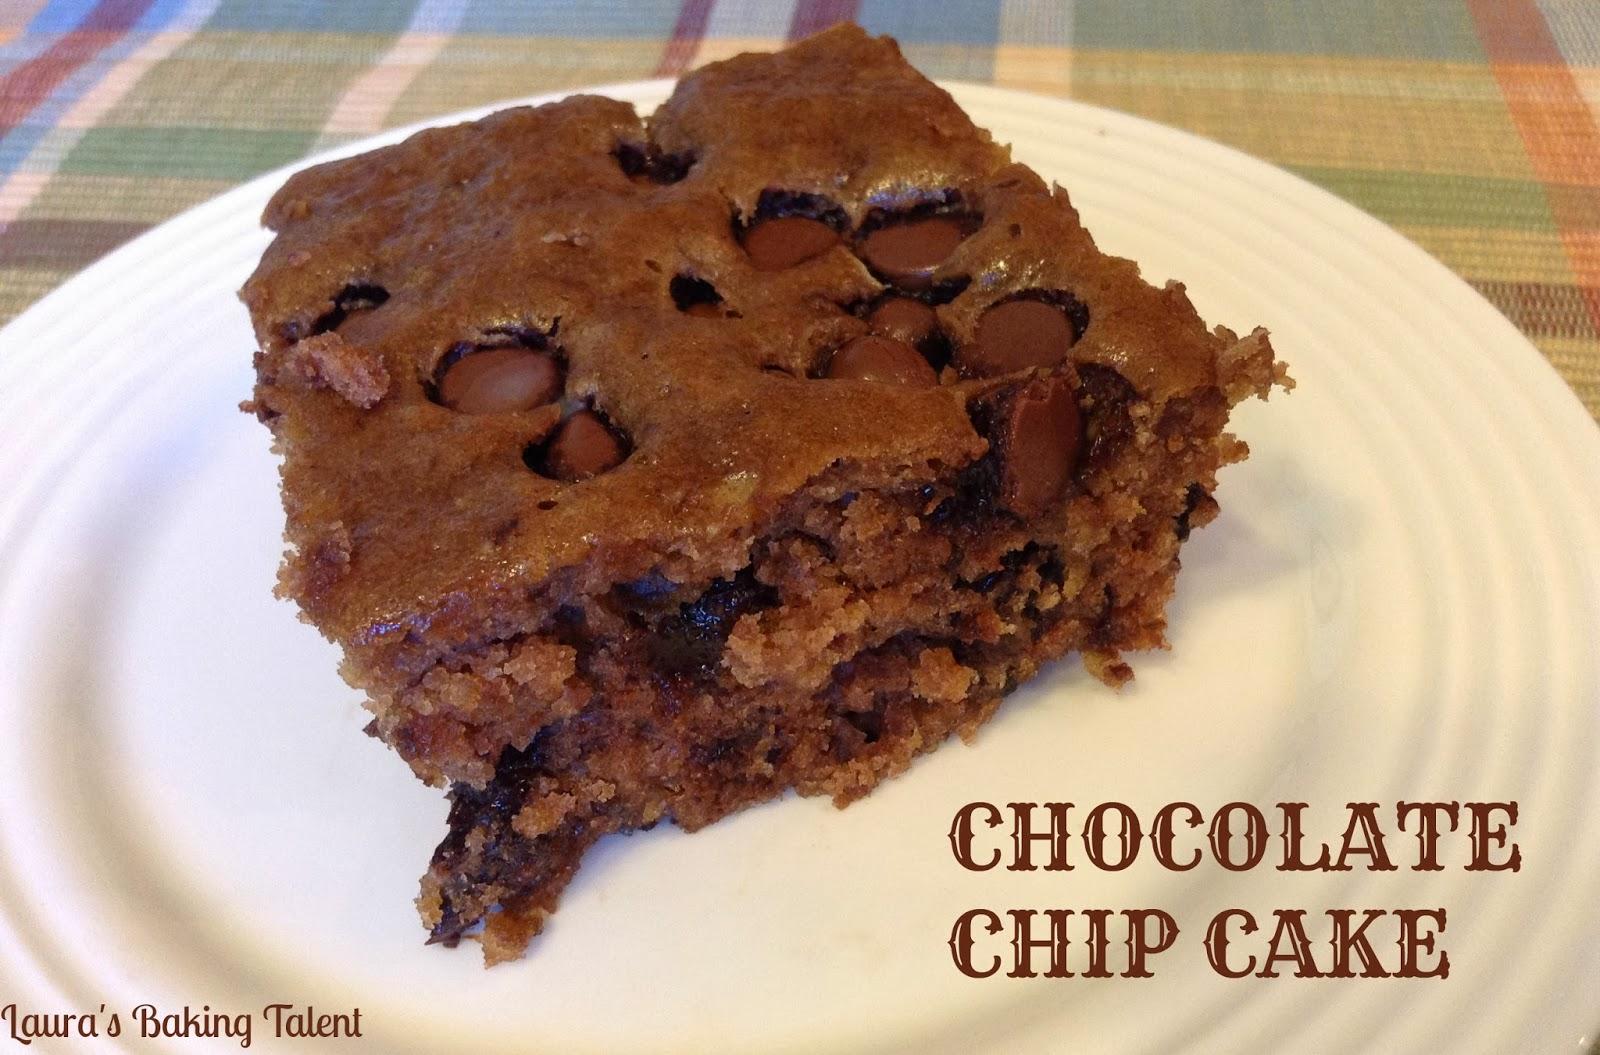 http://laurasbakingtalent.blogspot.com/2013/09/chocolate-chip-cake.html